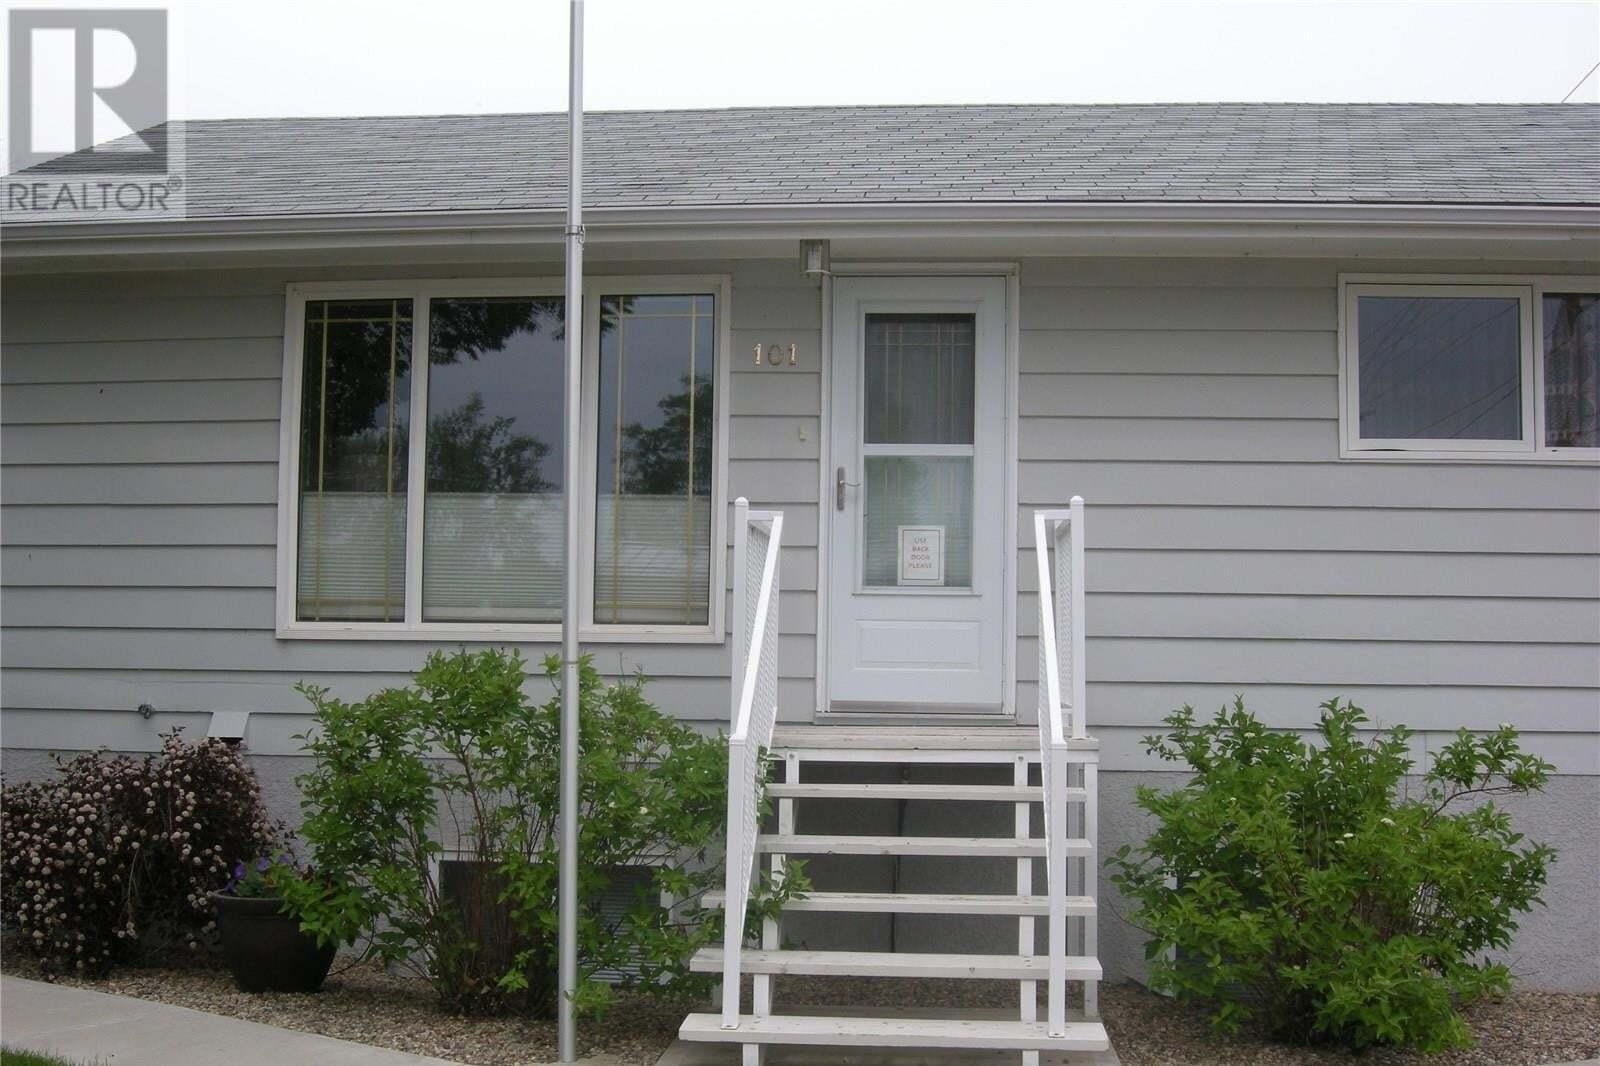 House for sale at 101 Aspen St Maple Creek Saskatchewan - MLS: SK813548